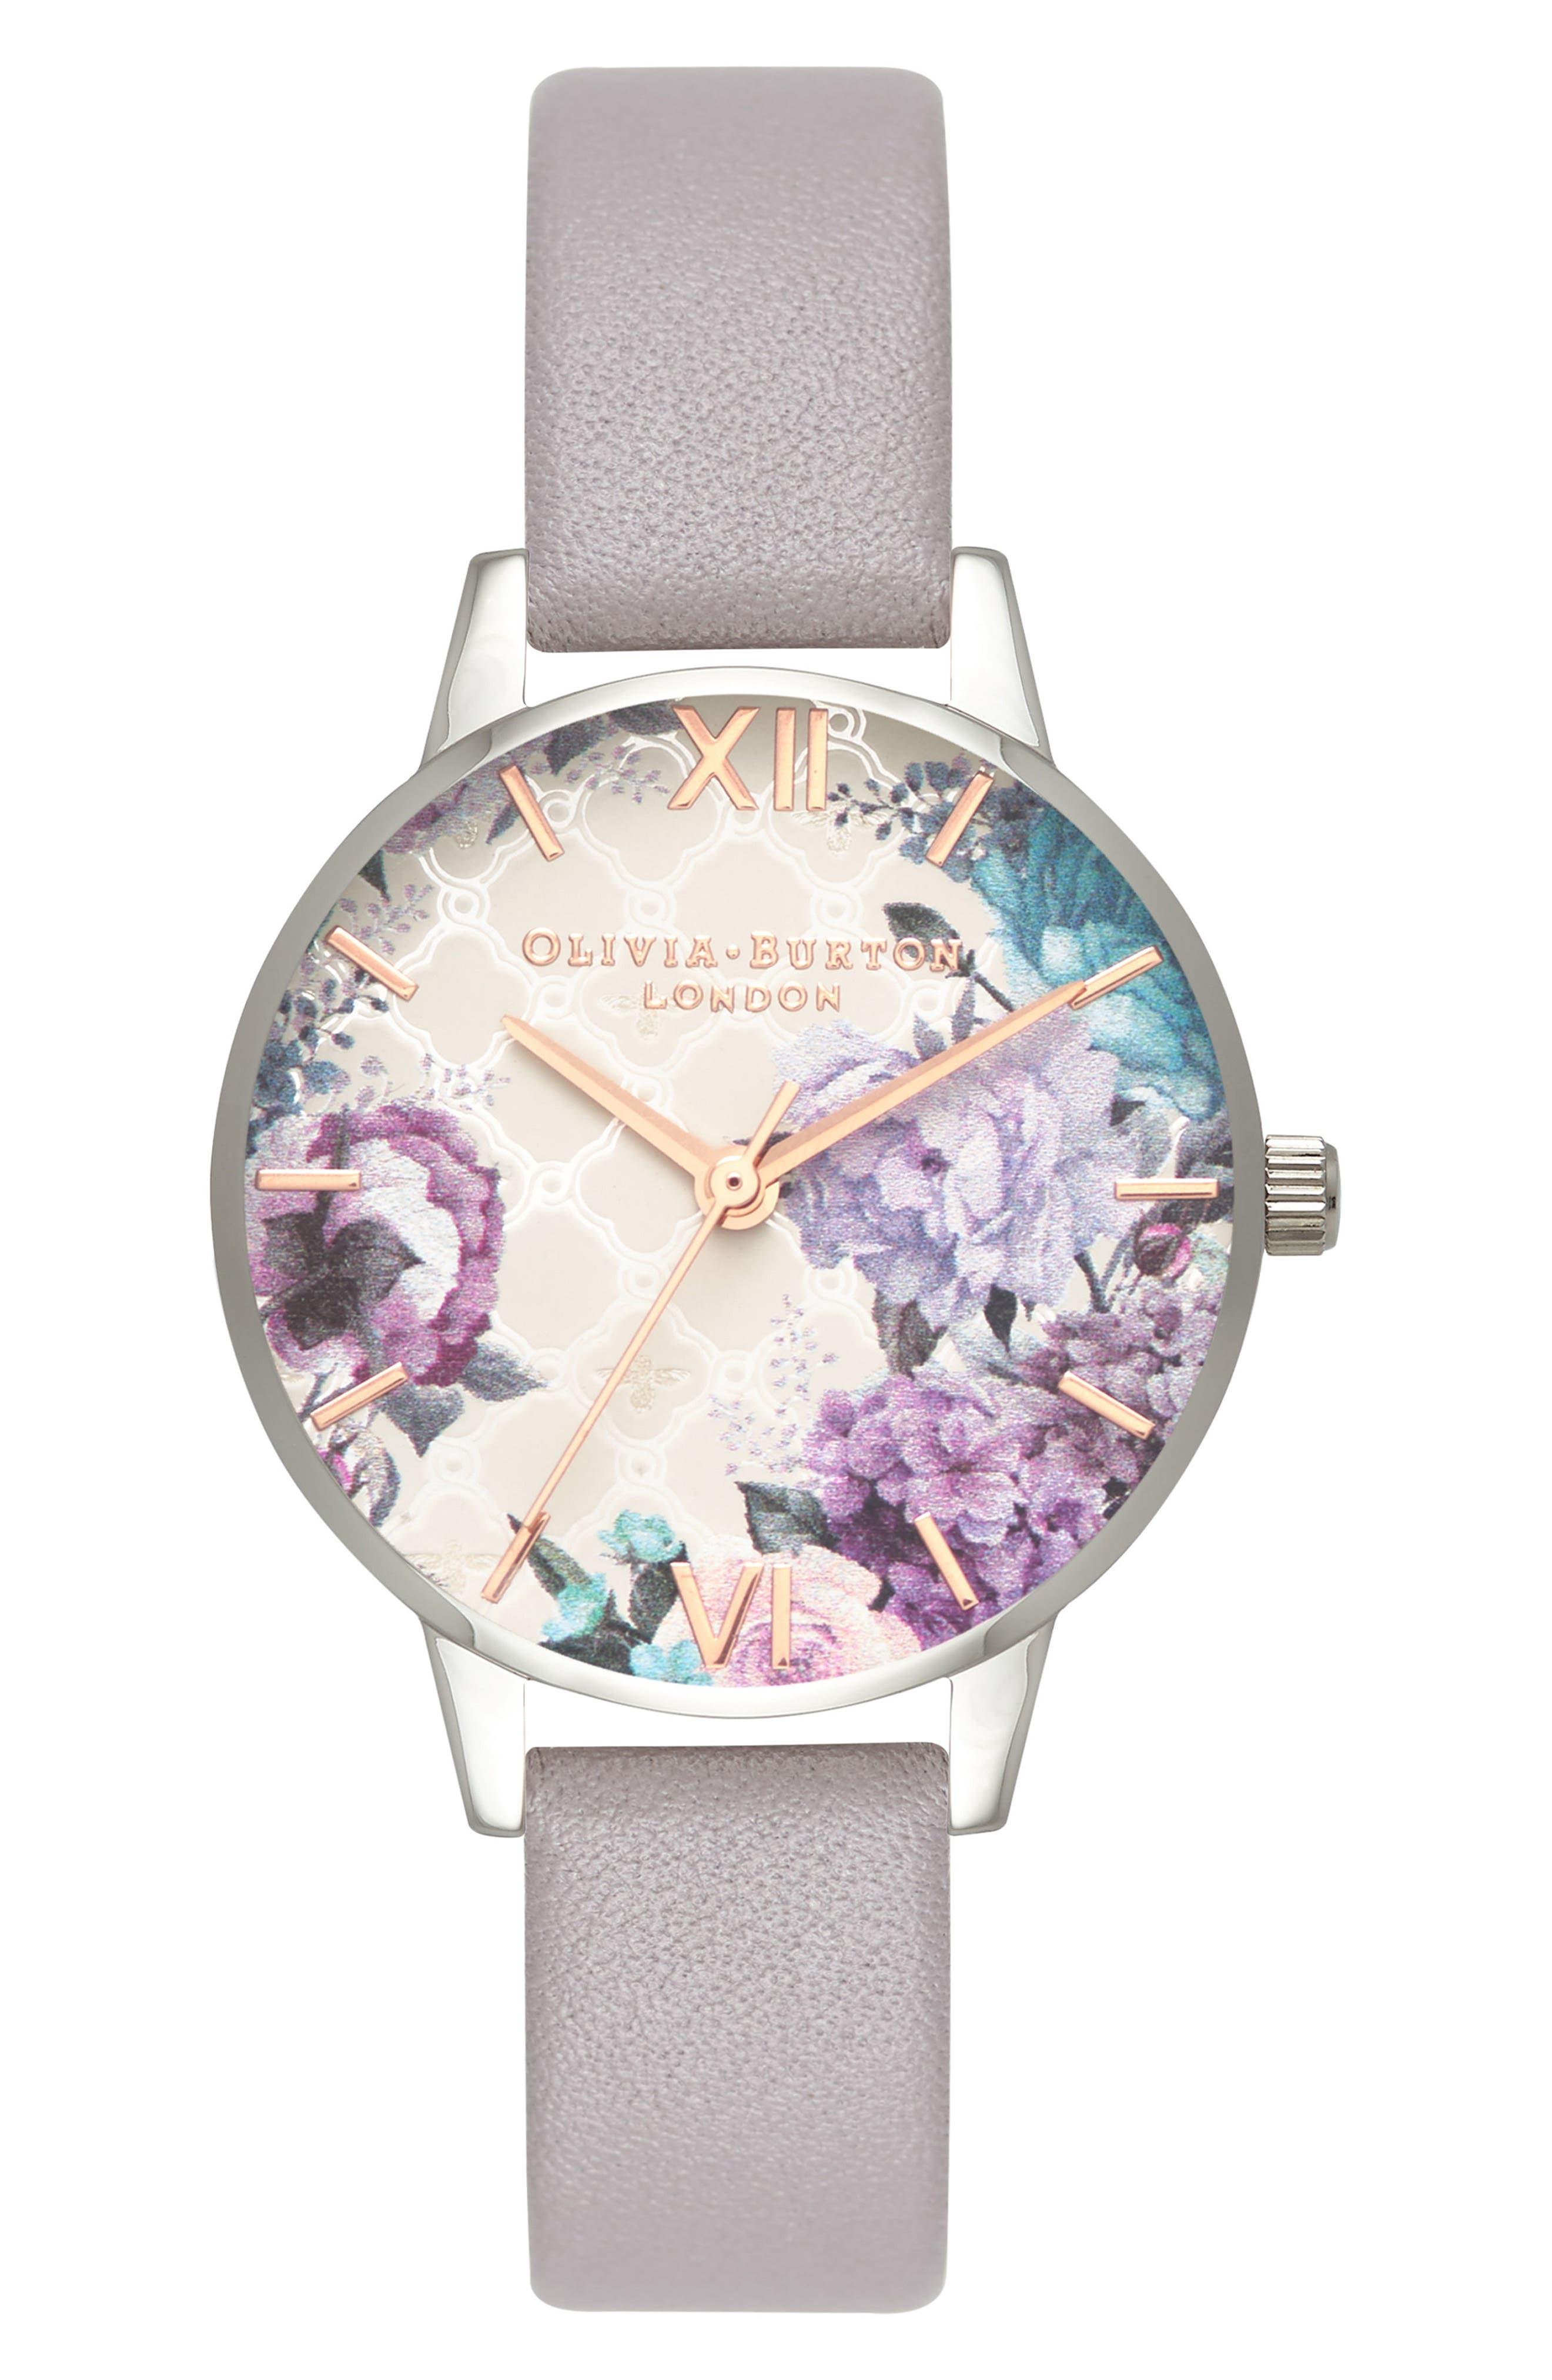 OLIVIA BURTON Glasshouse Leather Strap Watch, 30mm, Main, color, 028